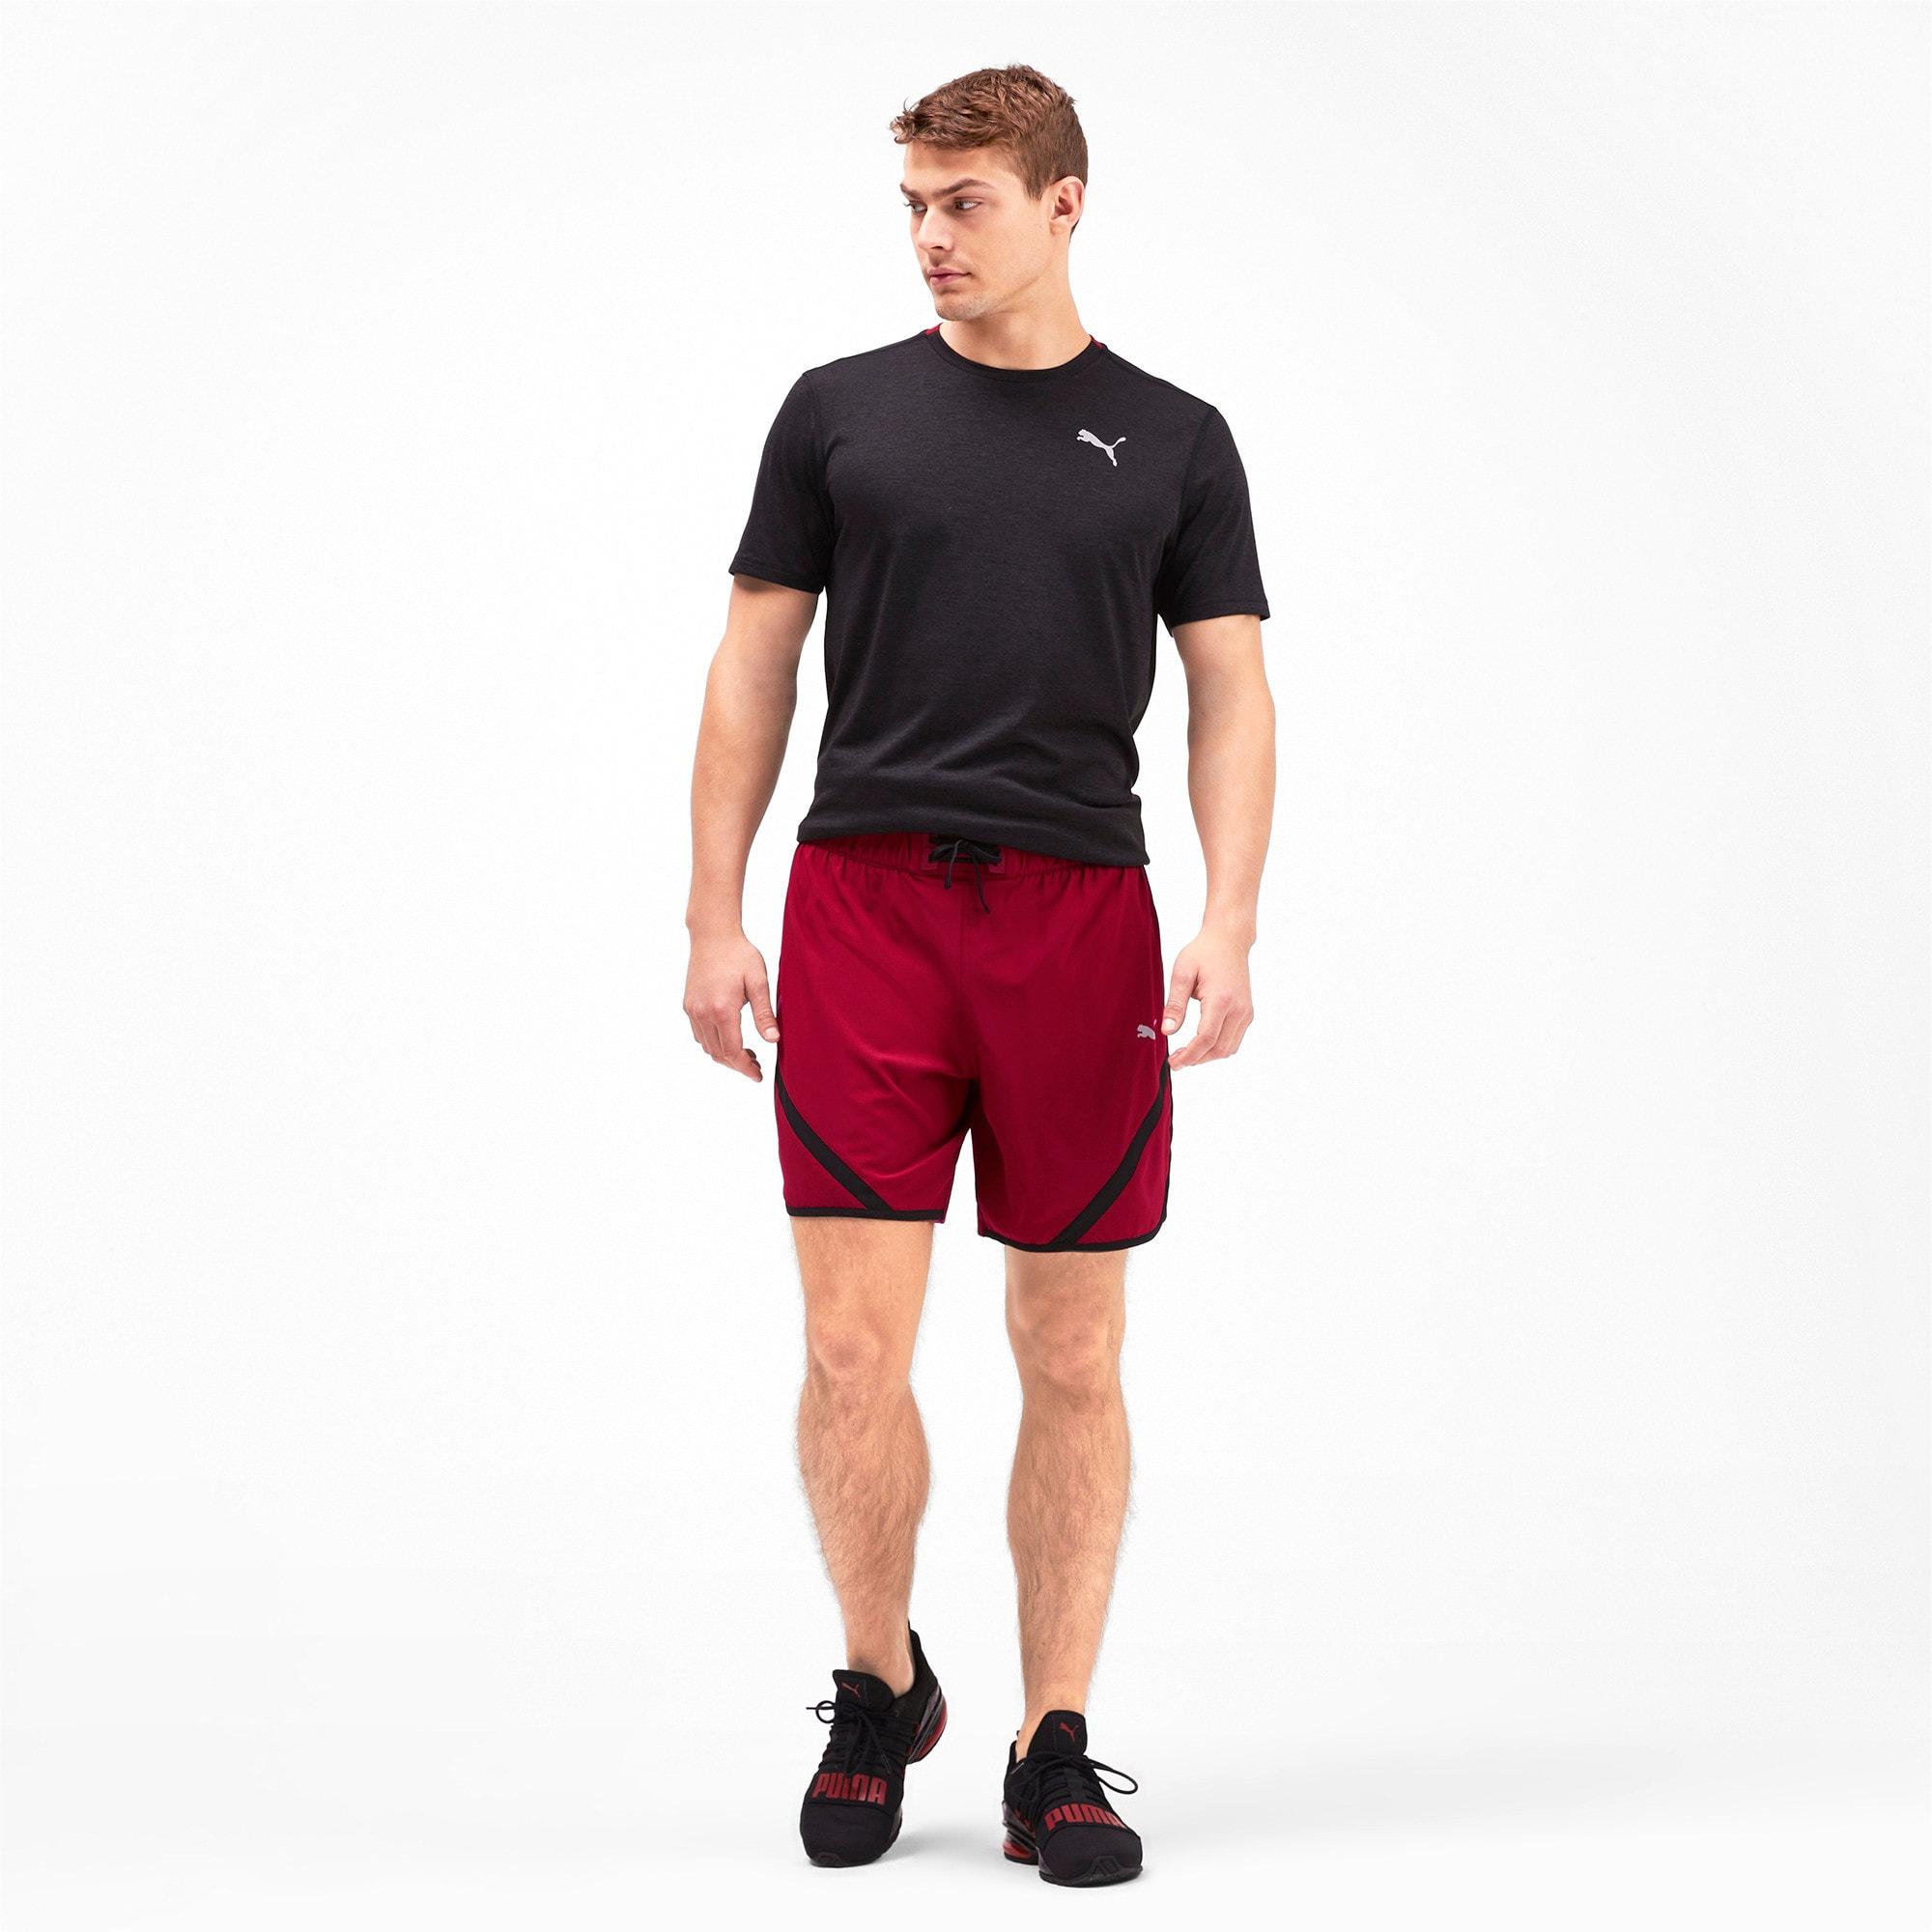 Thumbnail 3 of Get Fast Men's Shorts, Rhubarb-Puma Black, medium